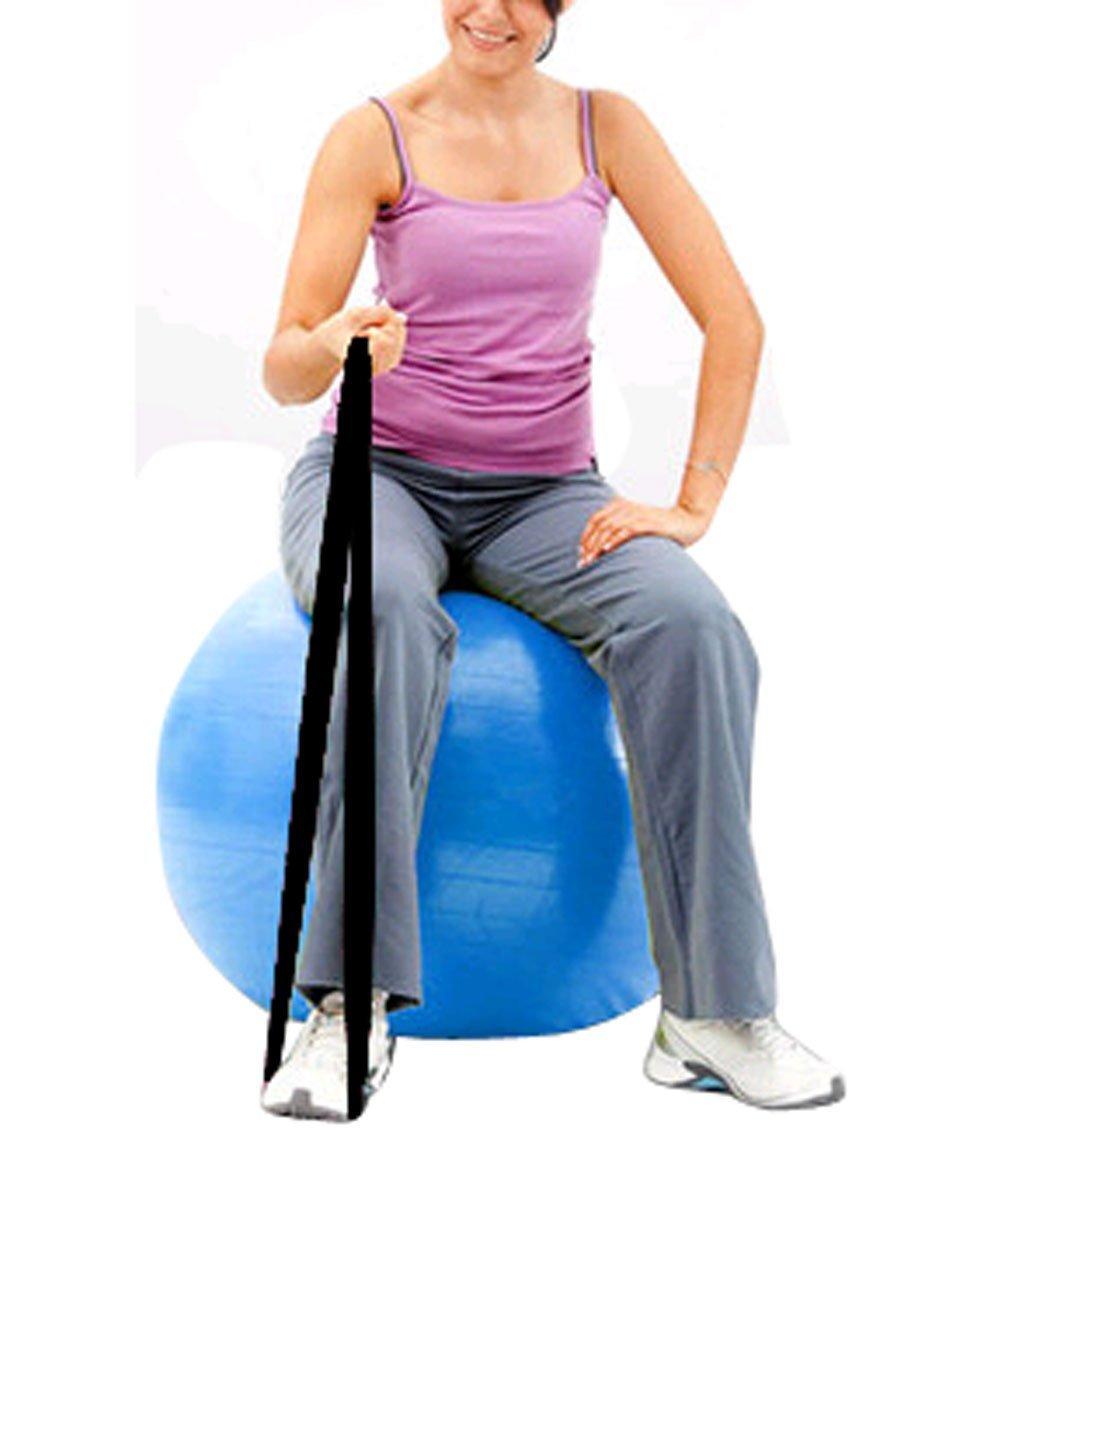 Amazon.com : DealMux Nylon Gym Exercício duplo D Anel Figura ...